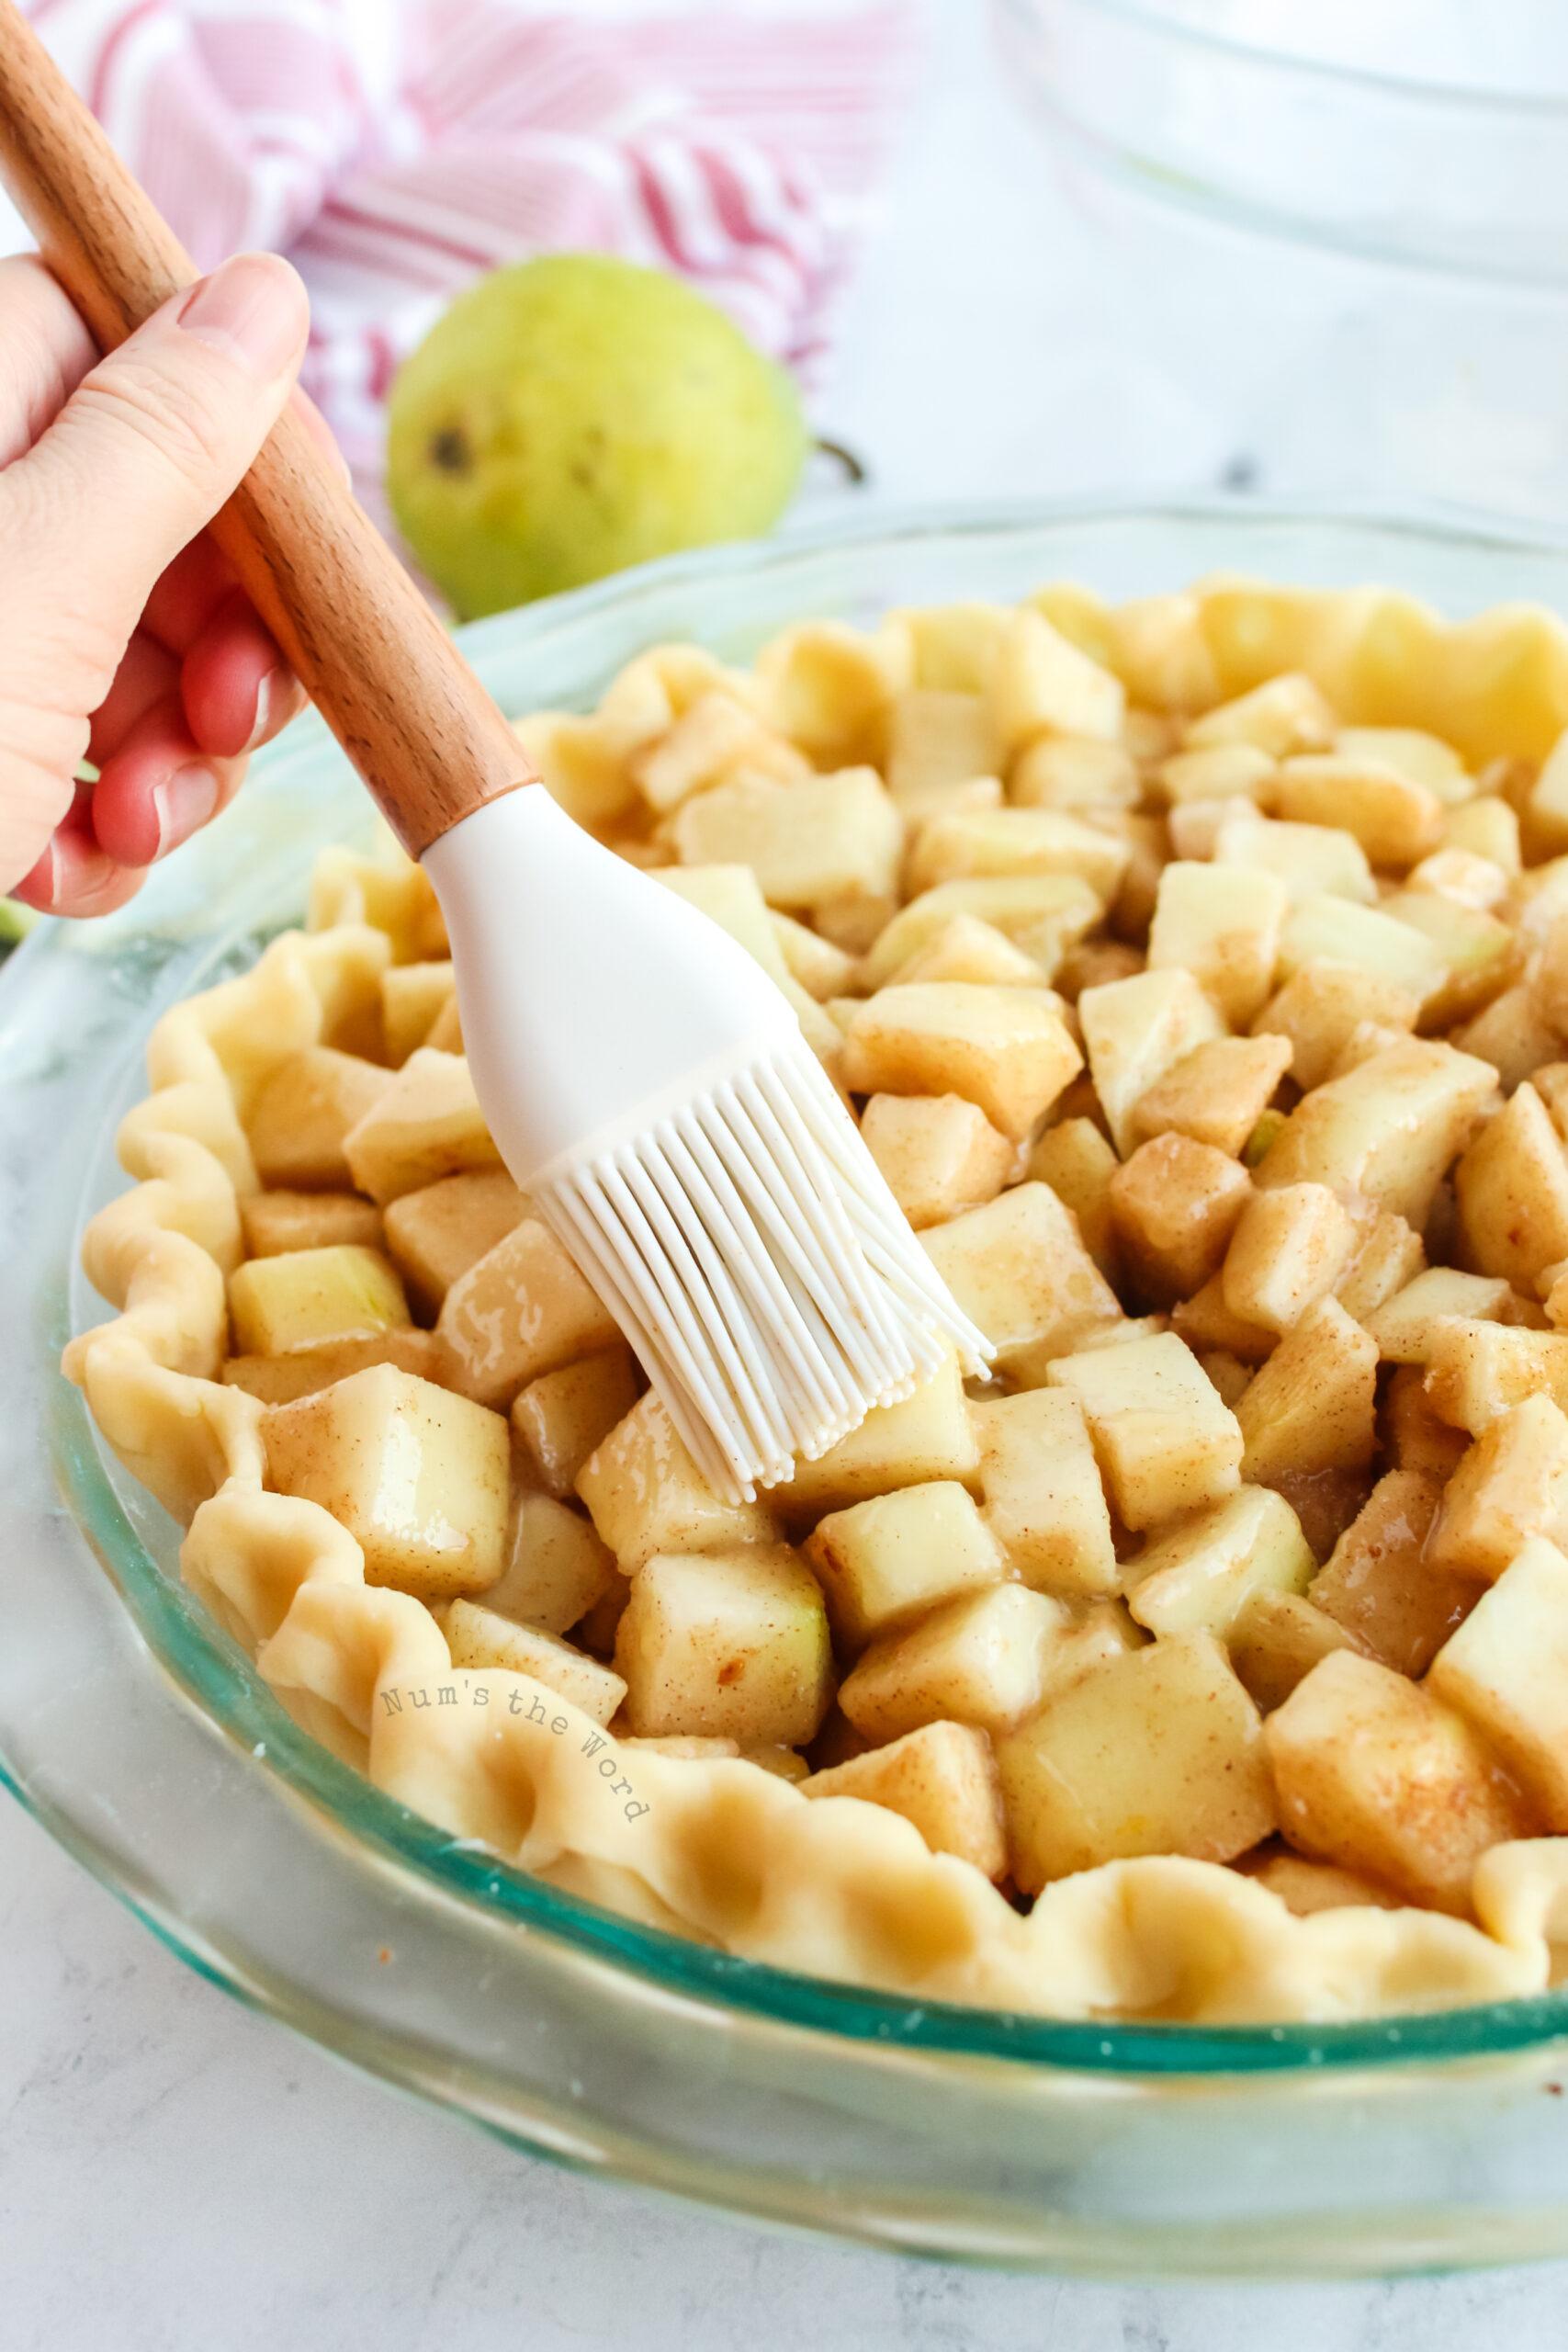 lemon juice spread over top of pears